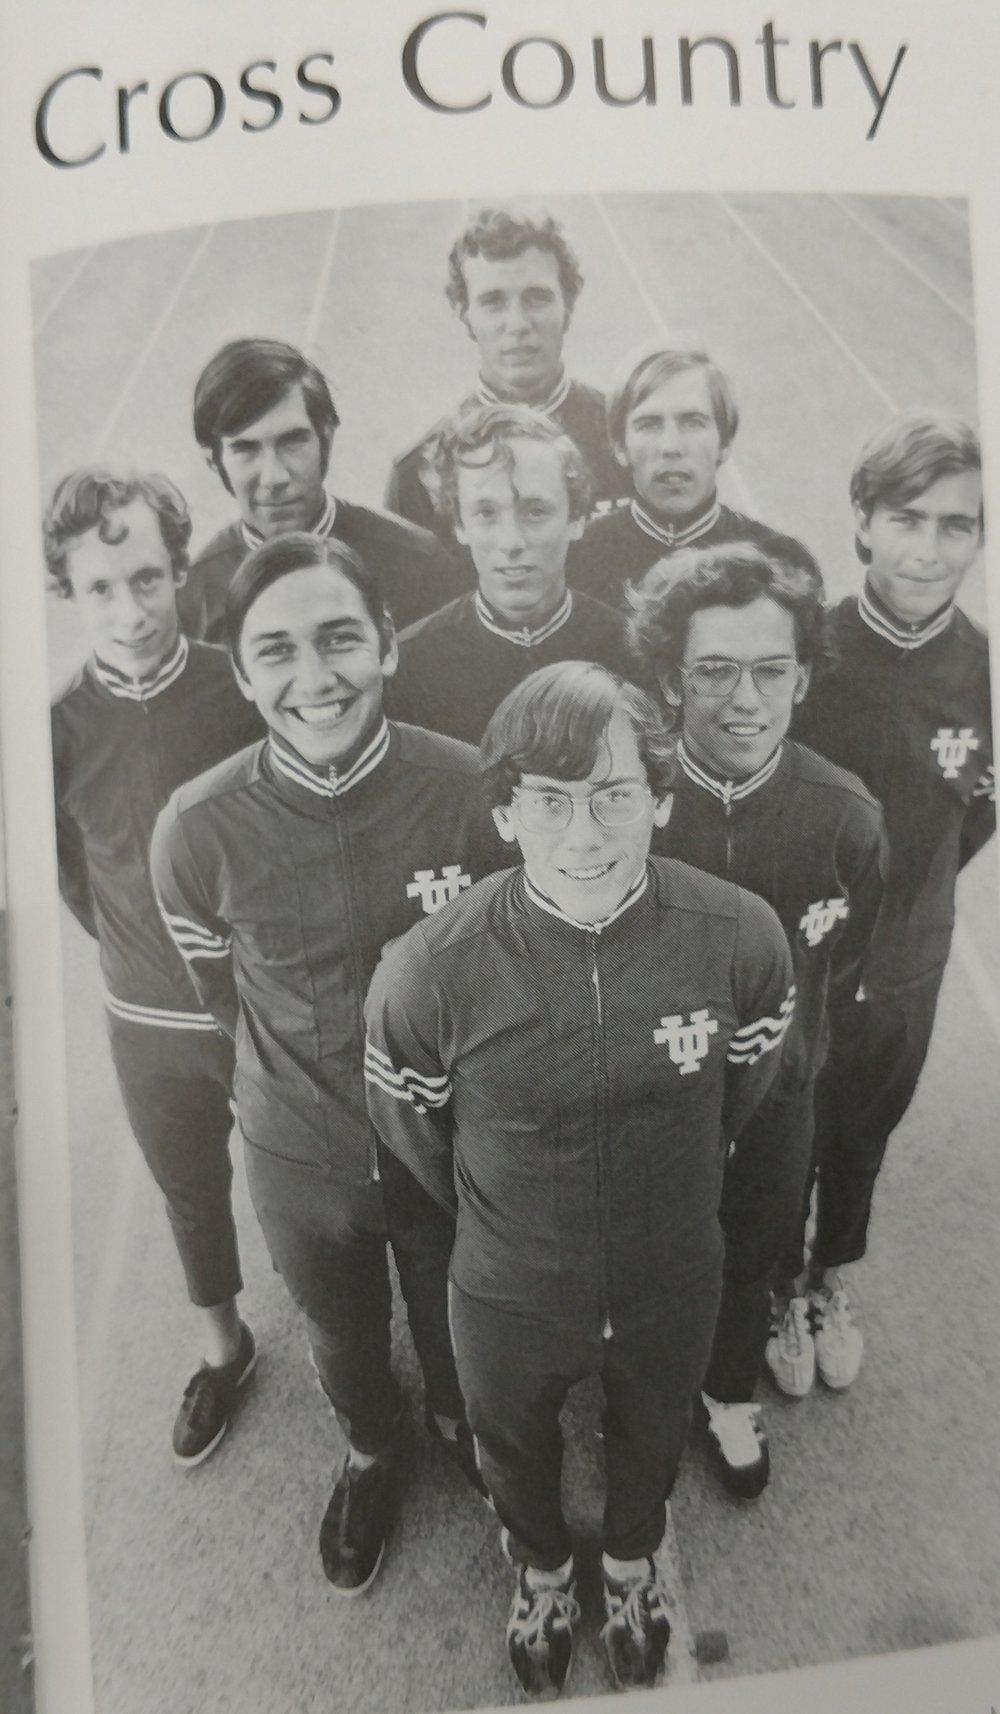 Cross Country 1972 (19).jpg